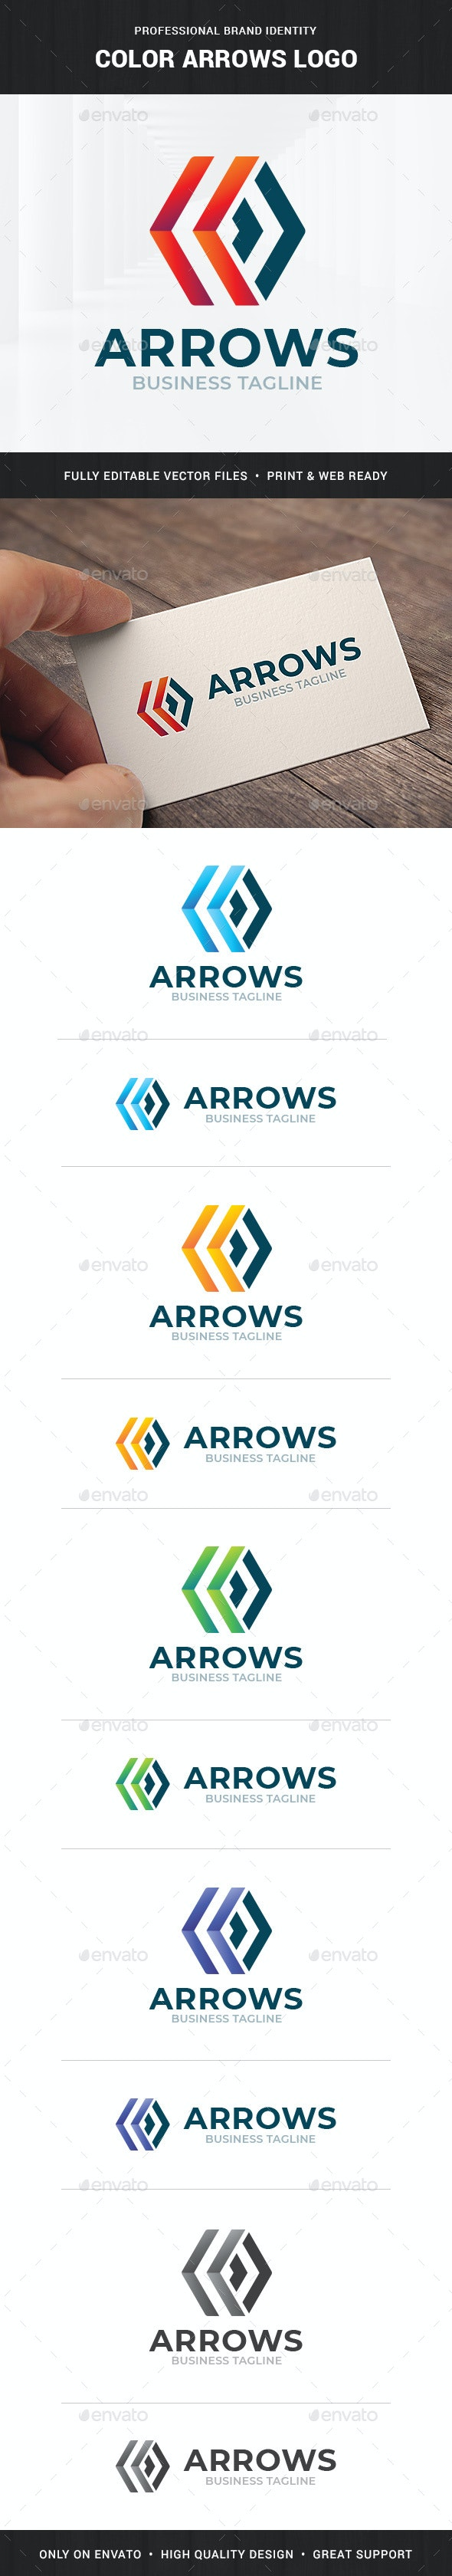 Color Arrows Logo Template - Symbols Logo Templates